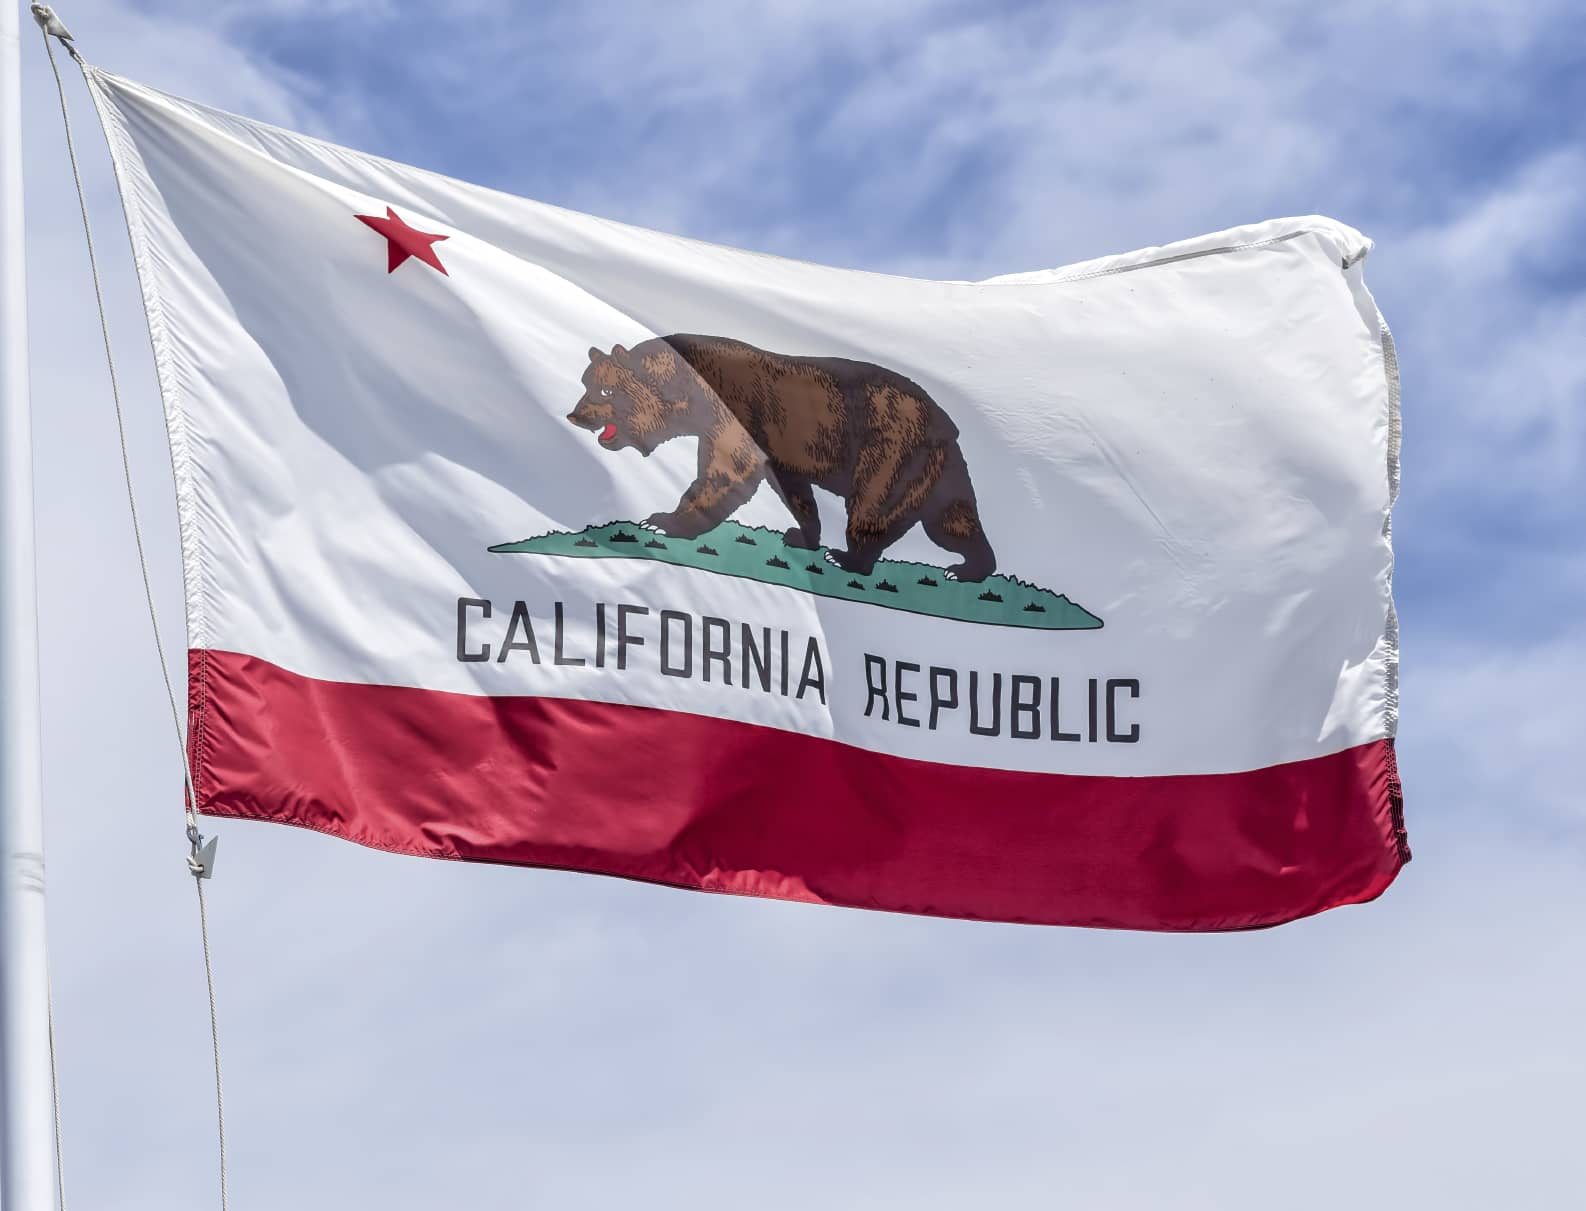 iStock_000044776234_Medium Bill To Establish 100% RPS Advances In California